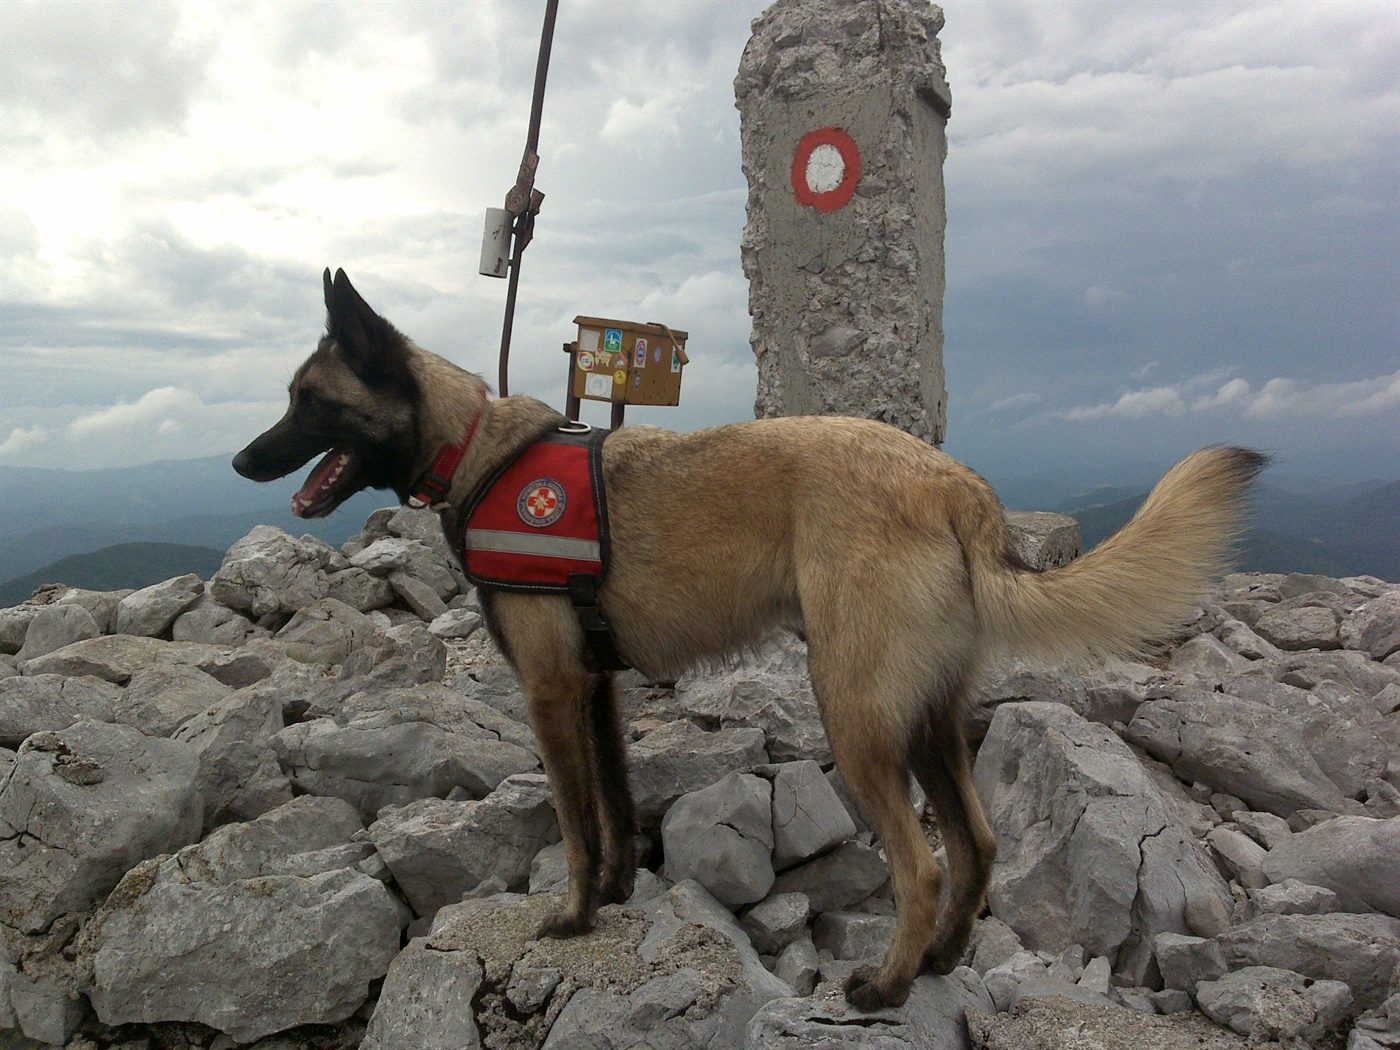 Preminuo potražni pas HGSS Stanice Rijeka - Luxa